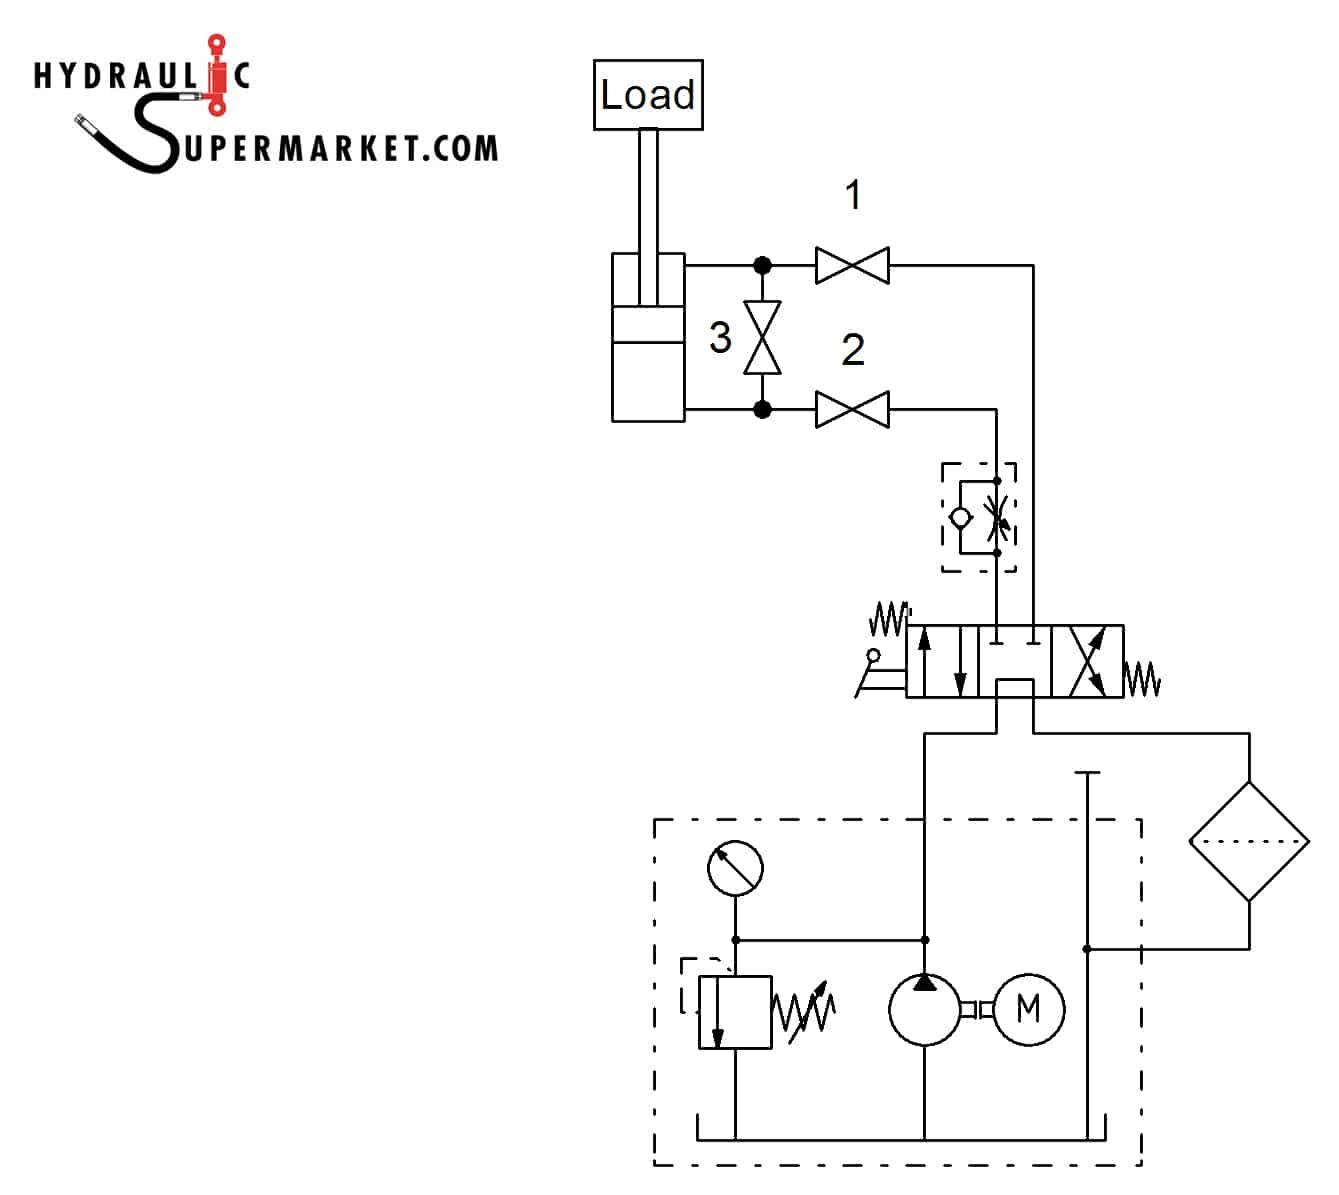 hydraulic piston diagram google search how it works pinte